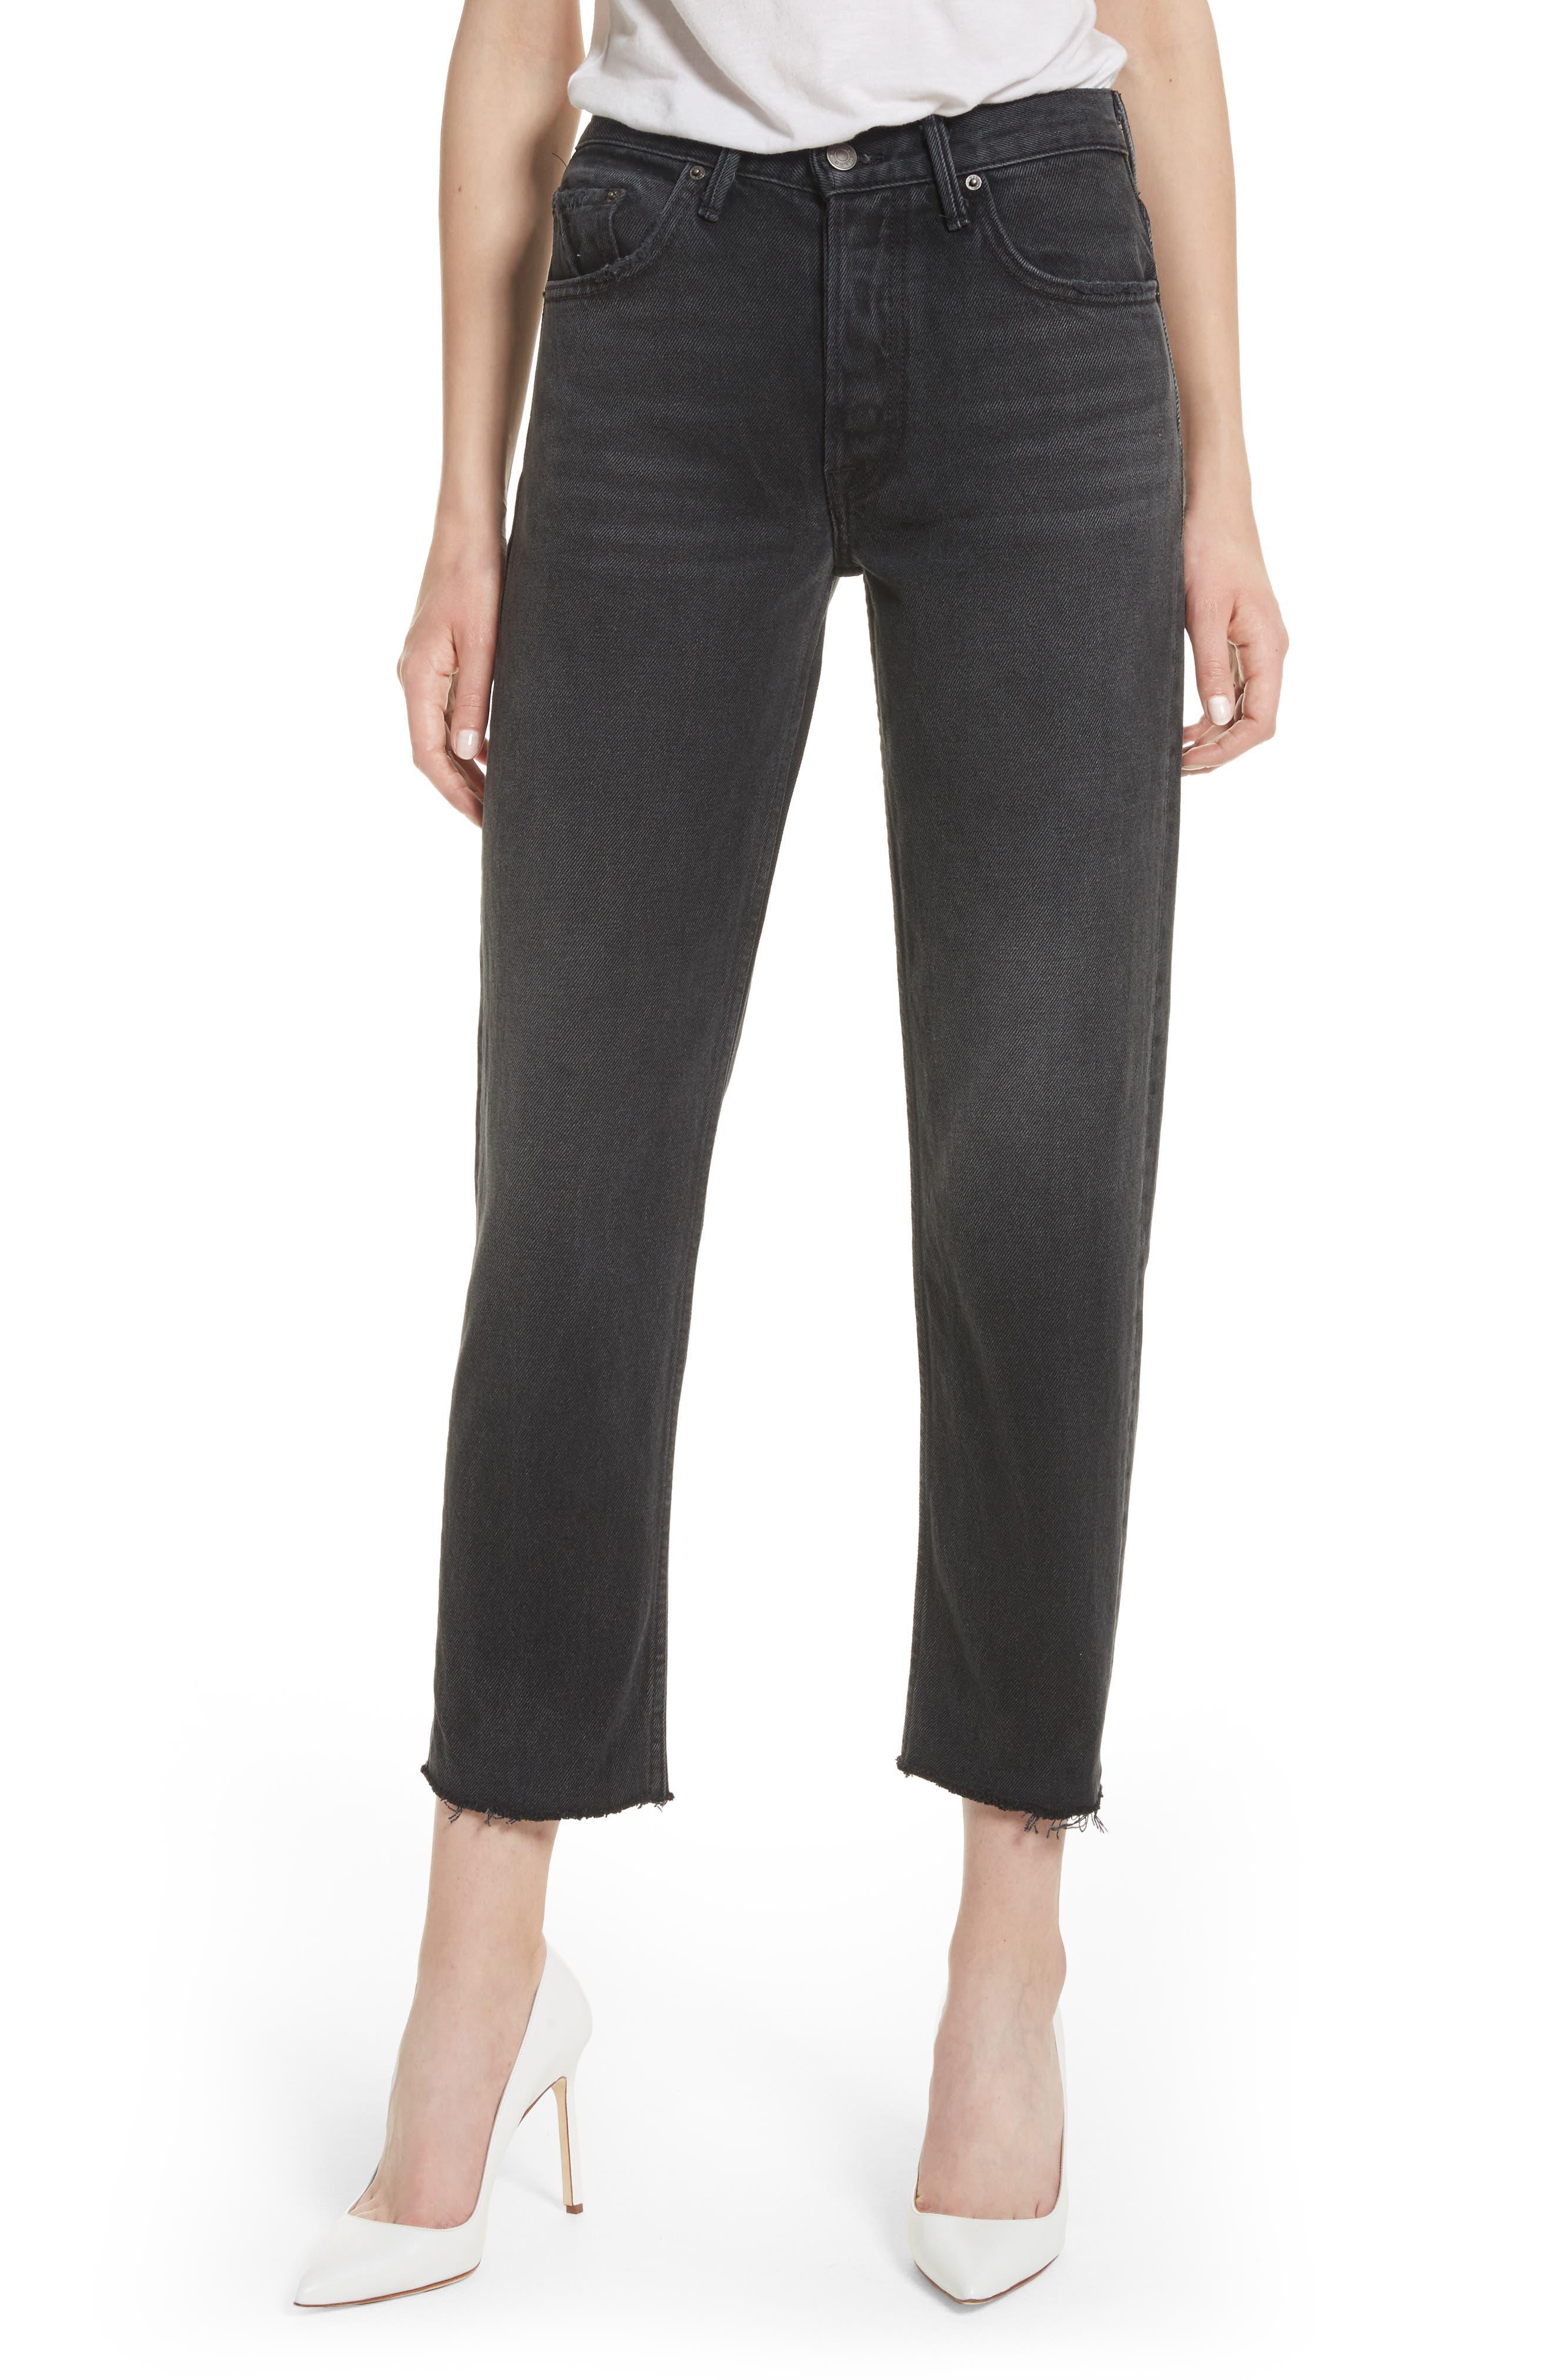 Helena Rigid High Waist Straight Jeans,                             Main thumbnail 1, color,                             PROUD MARY